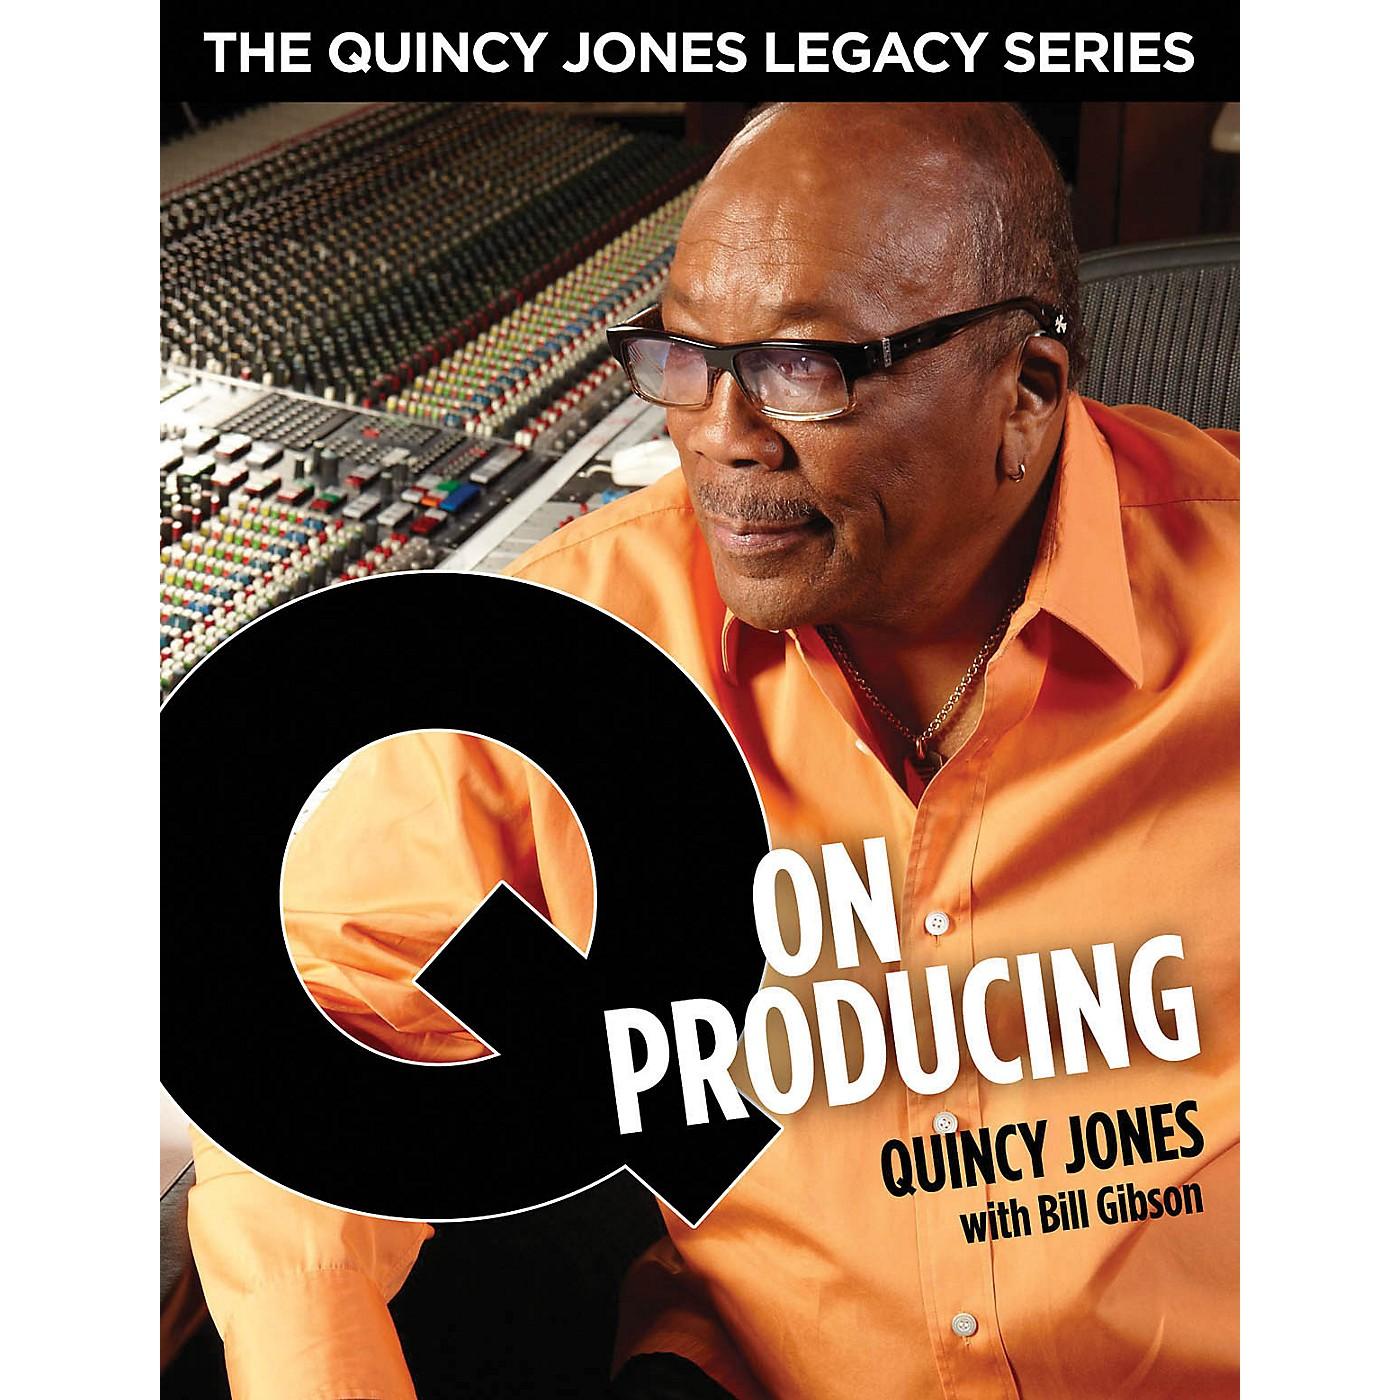 Hal Leonard The Quincy Jones Legacy Series - Q On Producing Book/DVD thumbnail